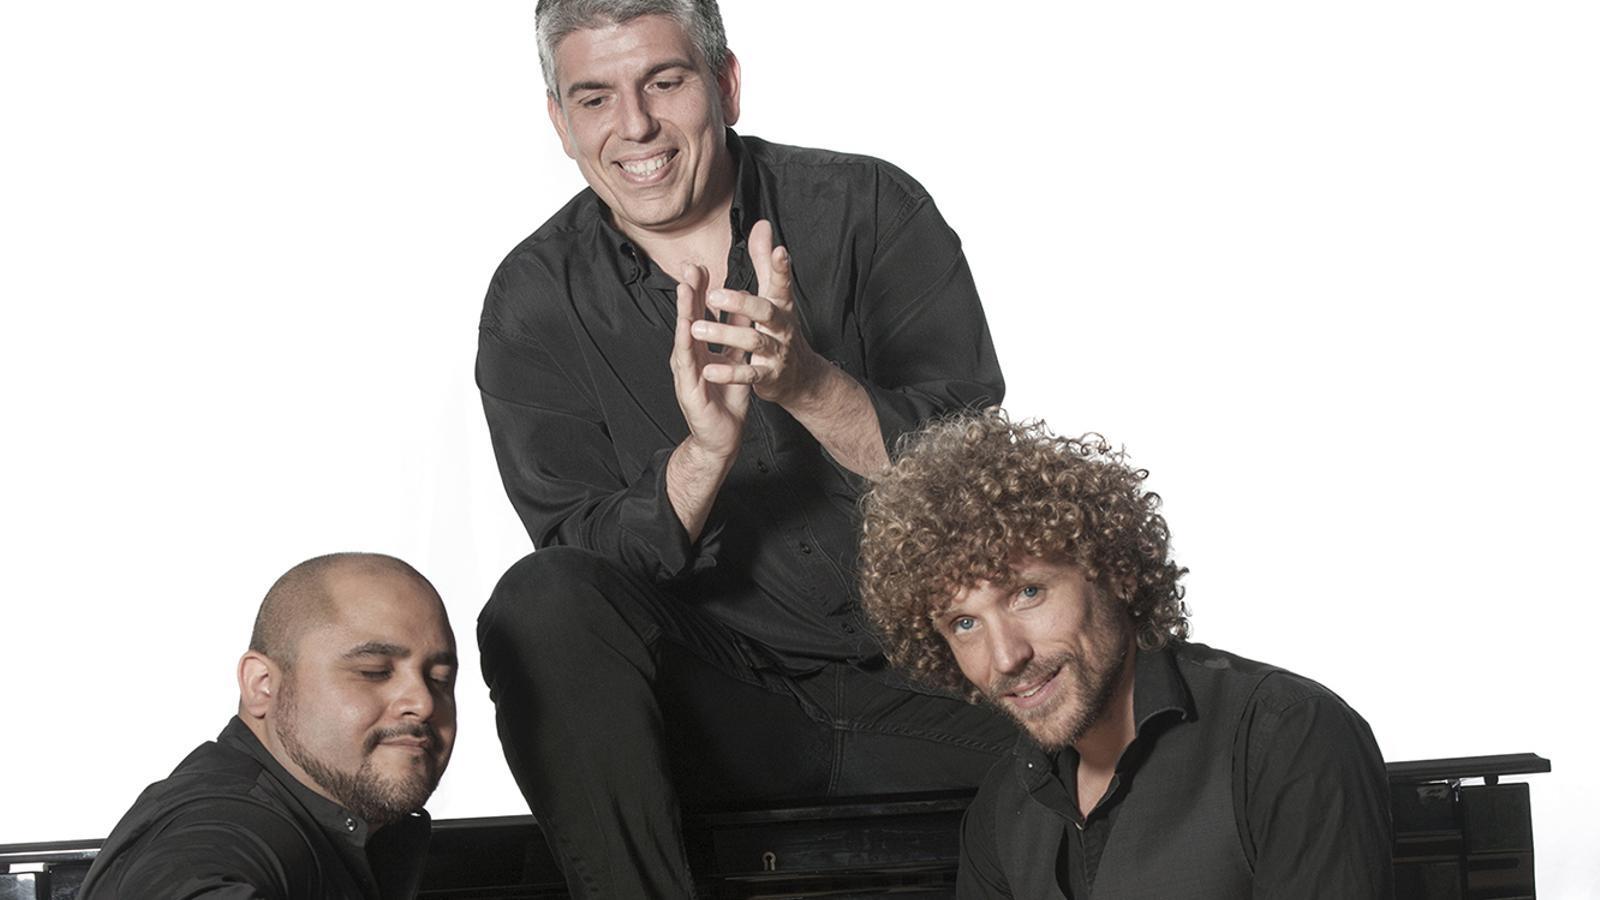 Jordi Barceló, Manuel Alonso i Pablo Gómez actuaran aquest dimecres al Pas de la Casa. / COMÚ D'ENCAMP